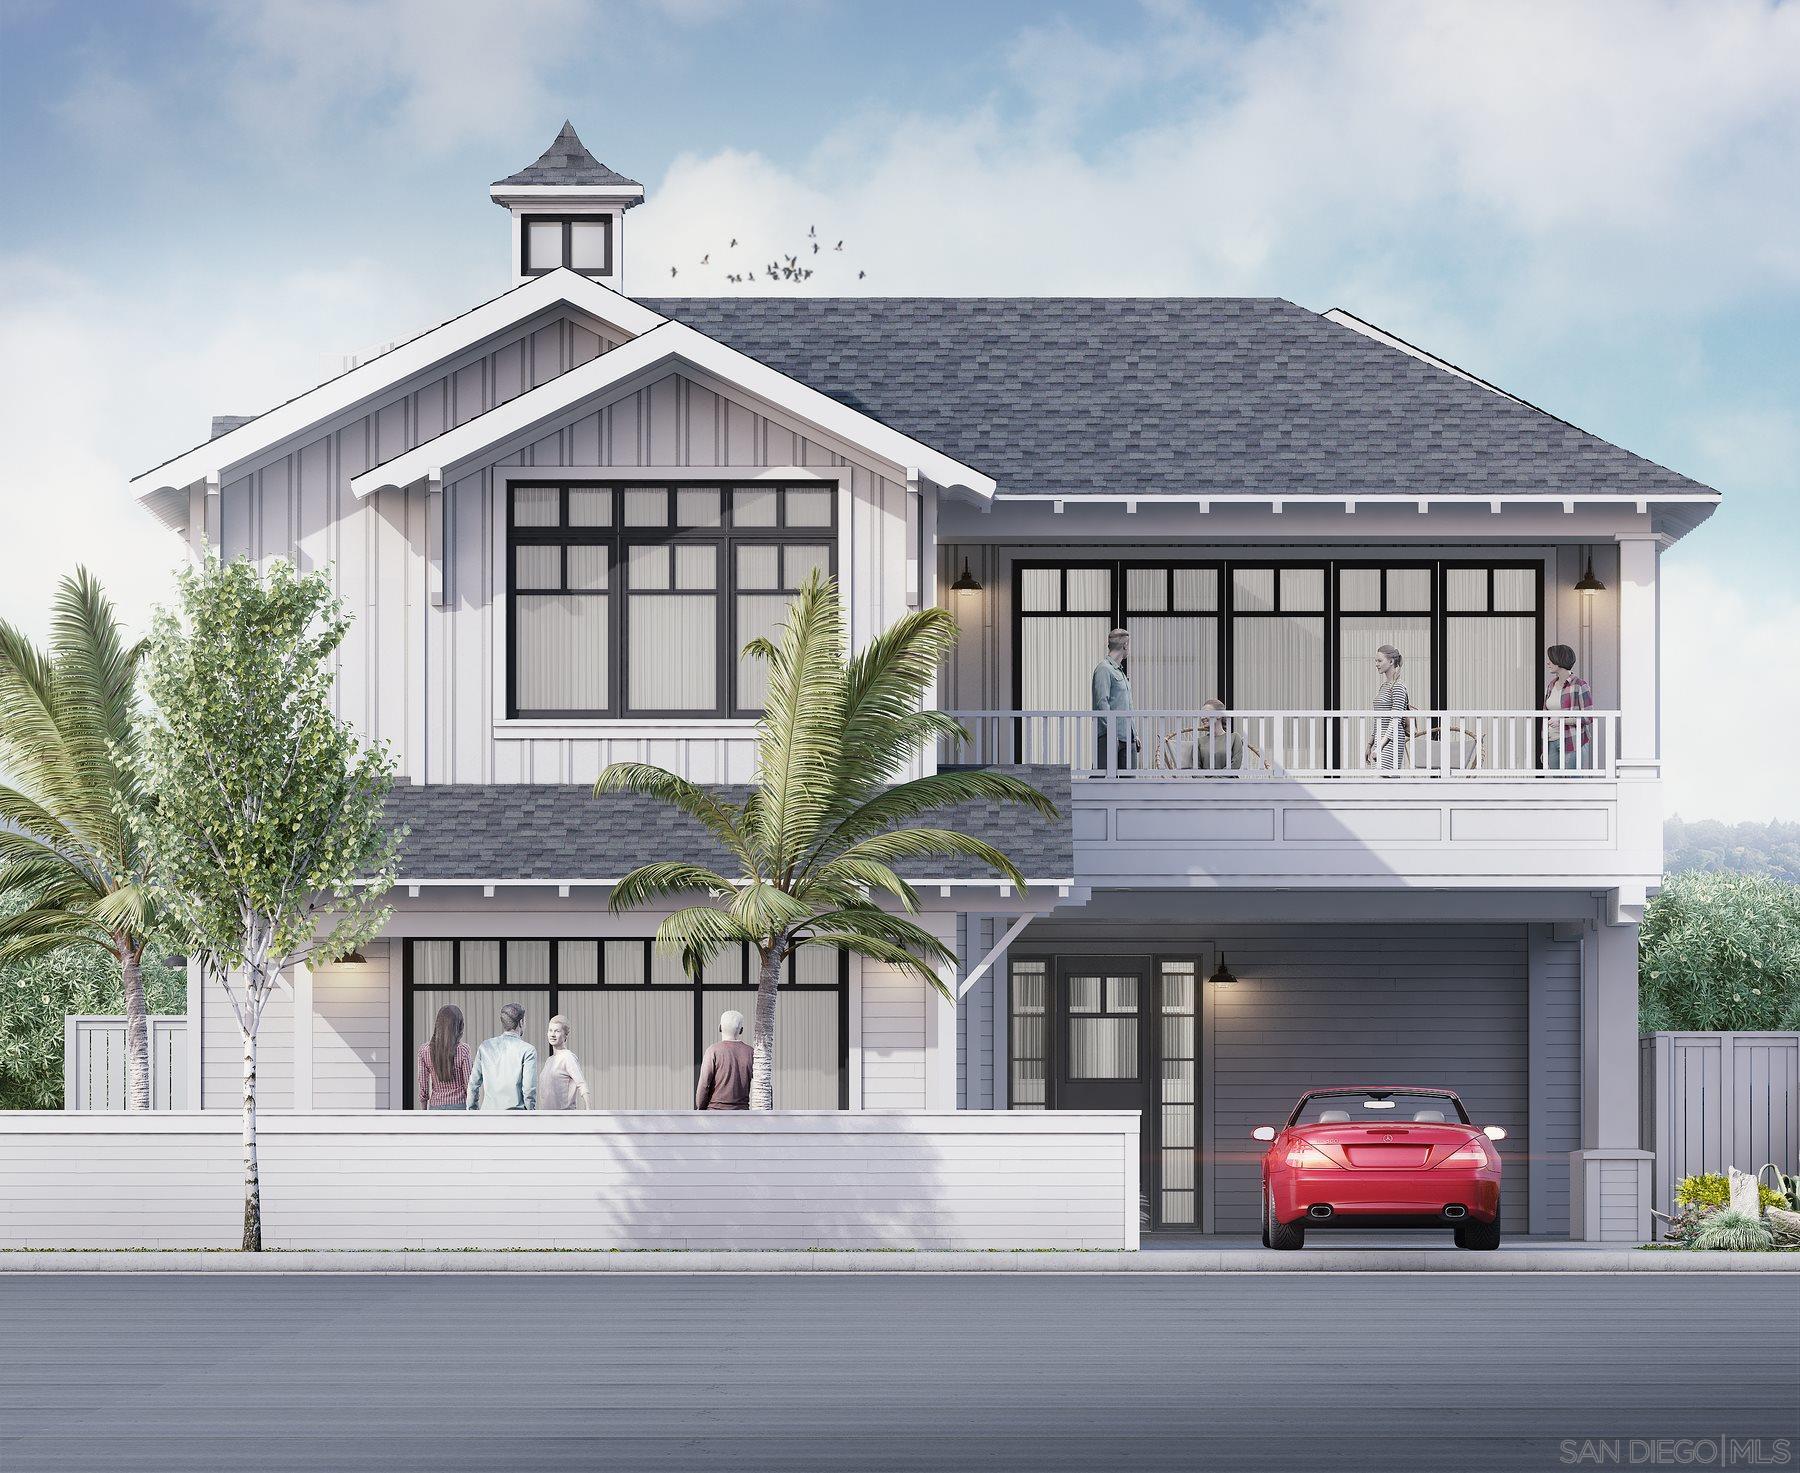 951 D Avenue, Coronado, California 92118, 3 Bedrooms Bedrooms, ,4 BathroomsBathrooms,Townhouse,For Sale,951 D Avenue,2,210004689